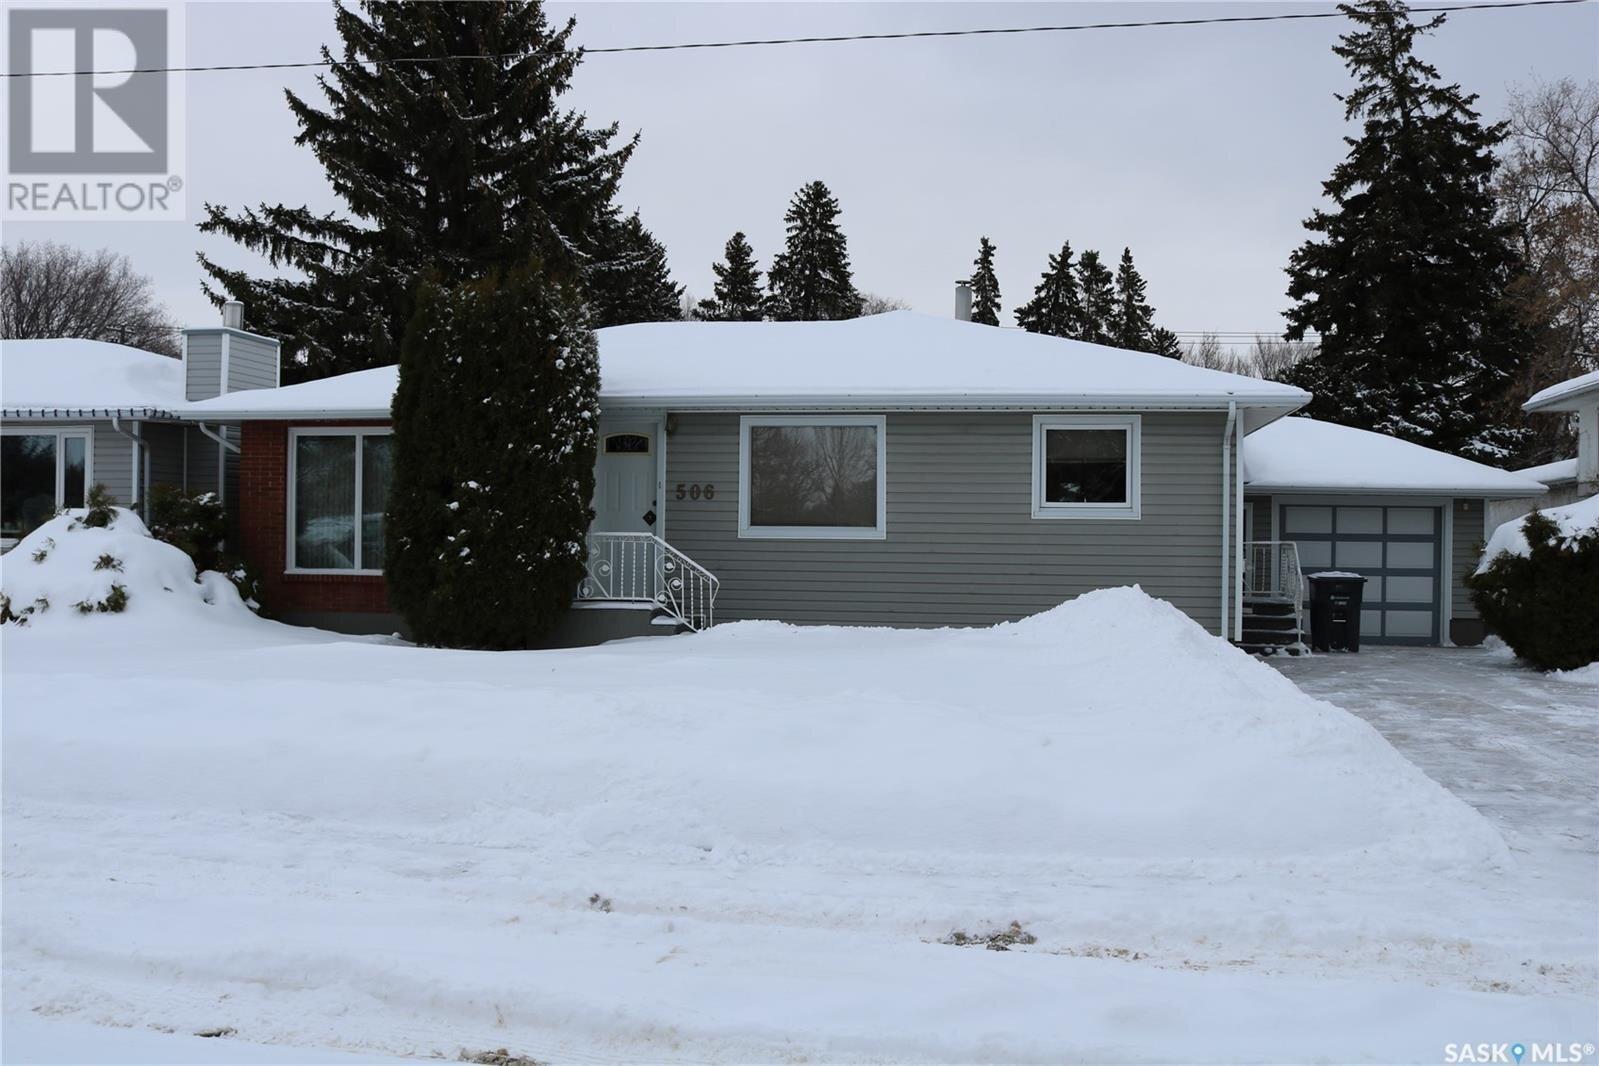 House for sale at 506 T Ave N Saskatoon Saskatchewan - MLS: SK839395